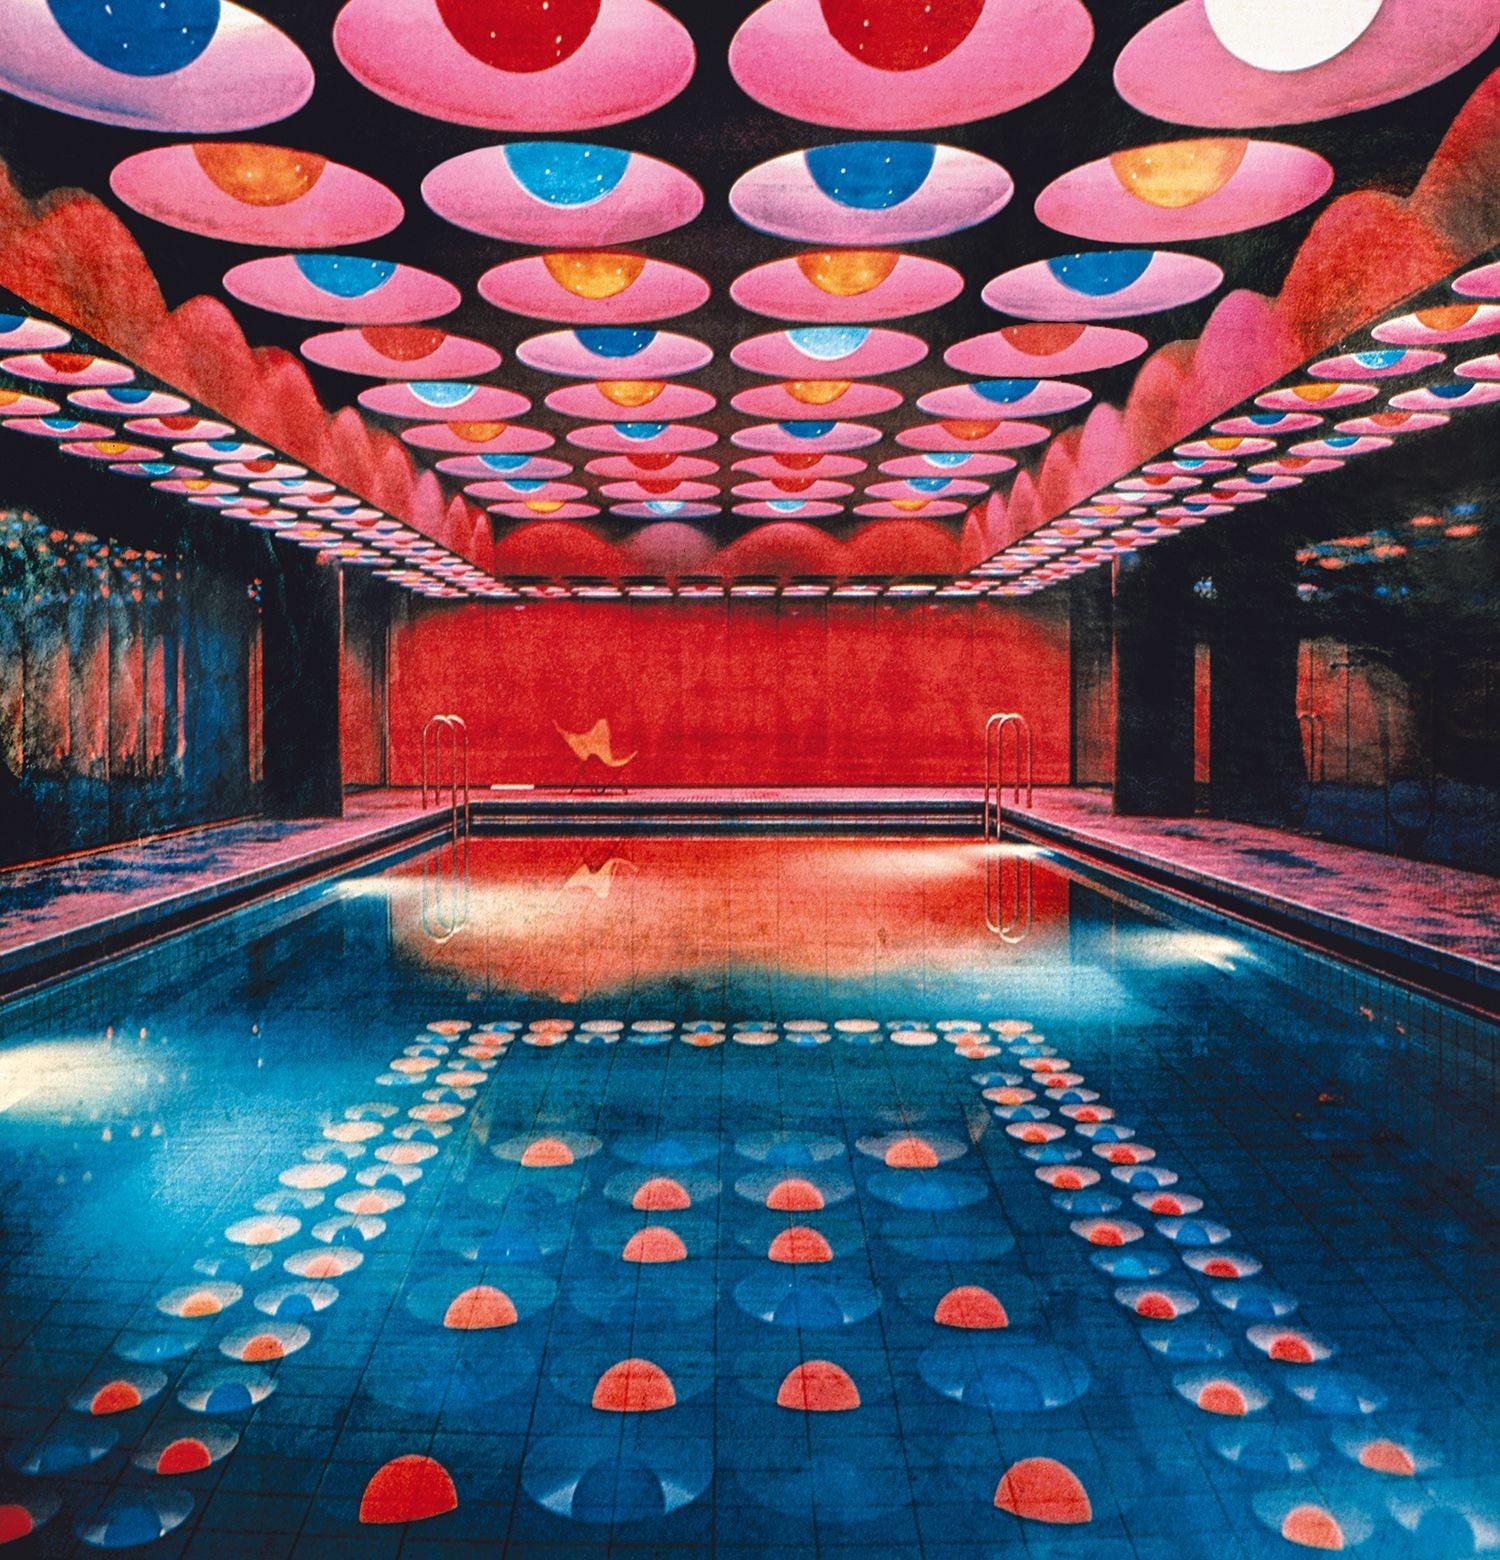 verner_panton_spiegel_swimming_pool_phaidon.jpg